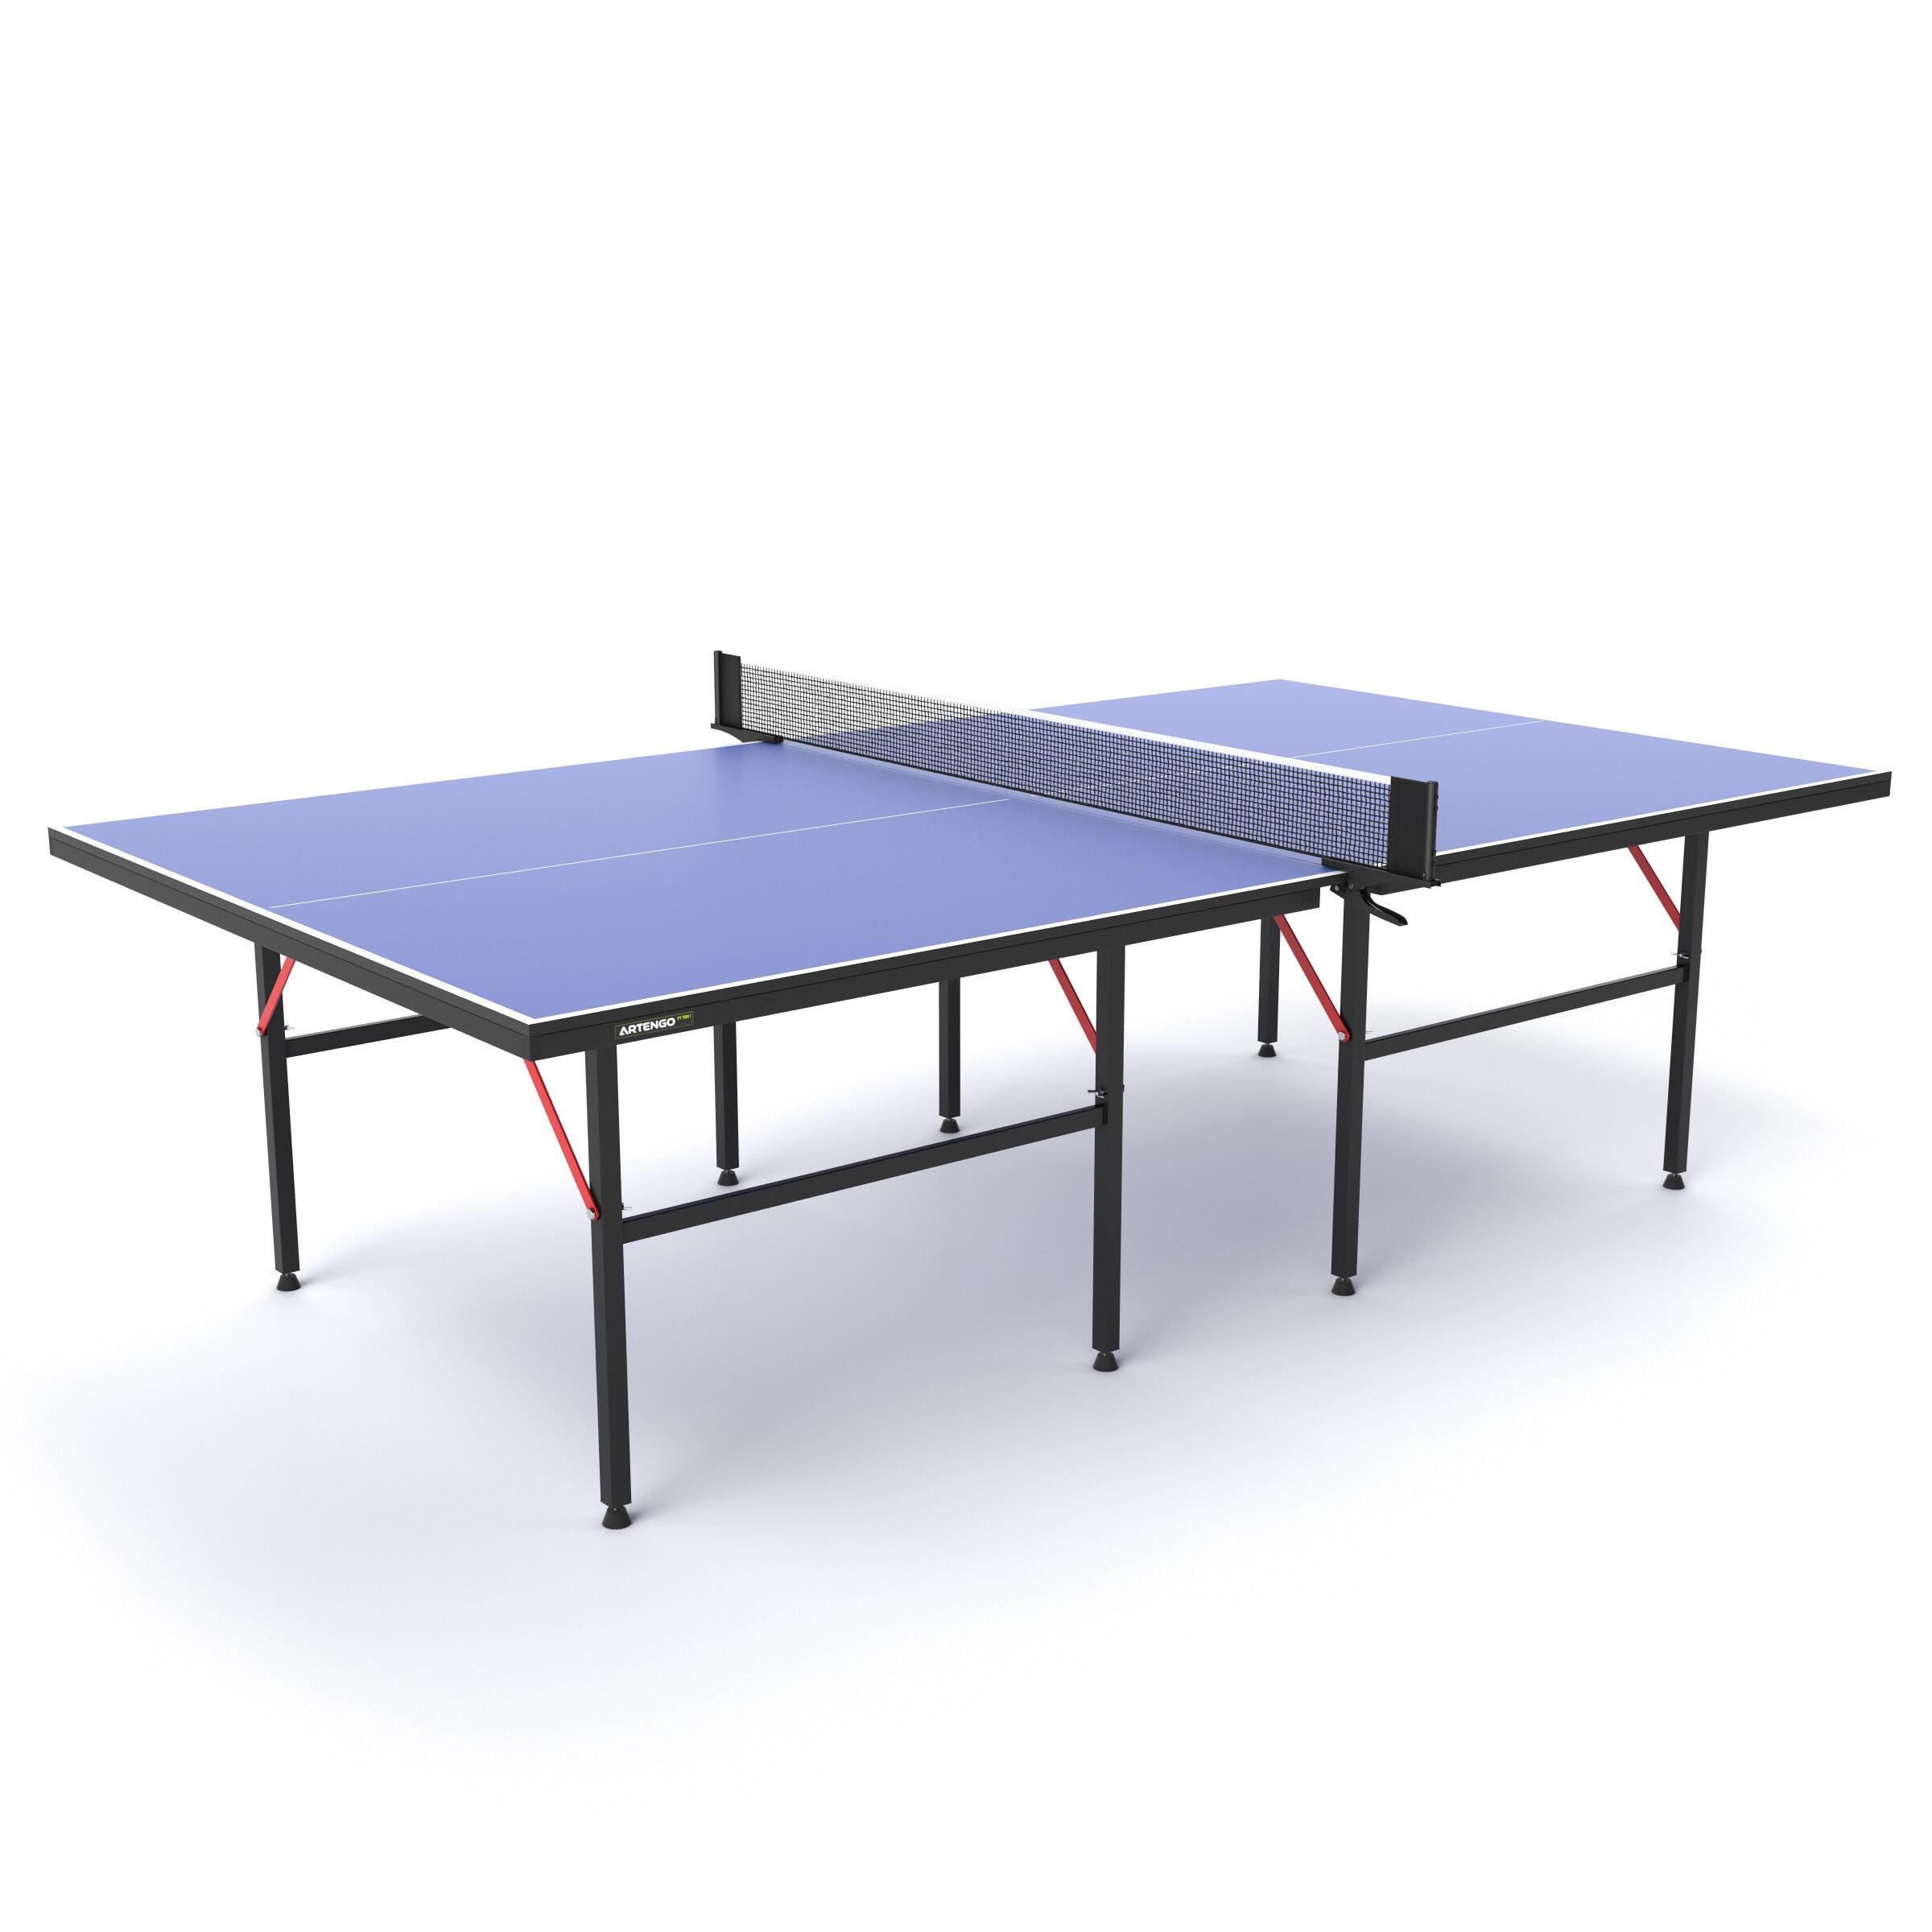 d991ea18c Comprar Mesas de interior y exterior de ping pong online